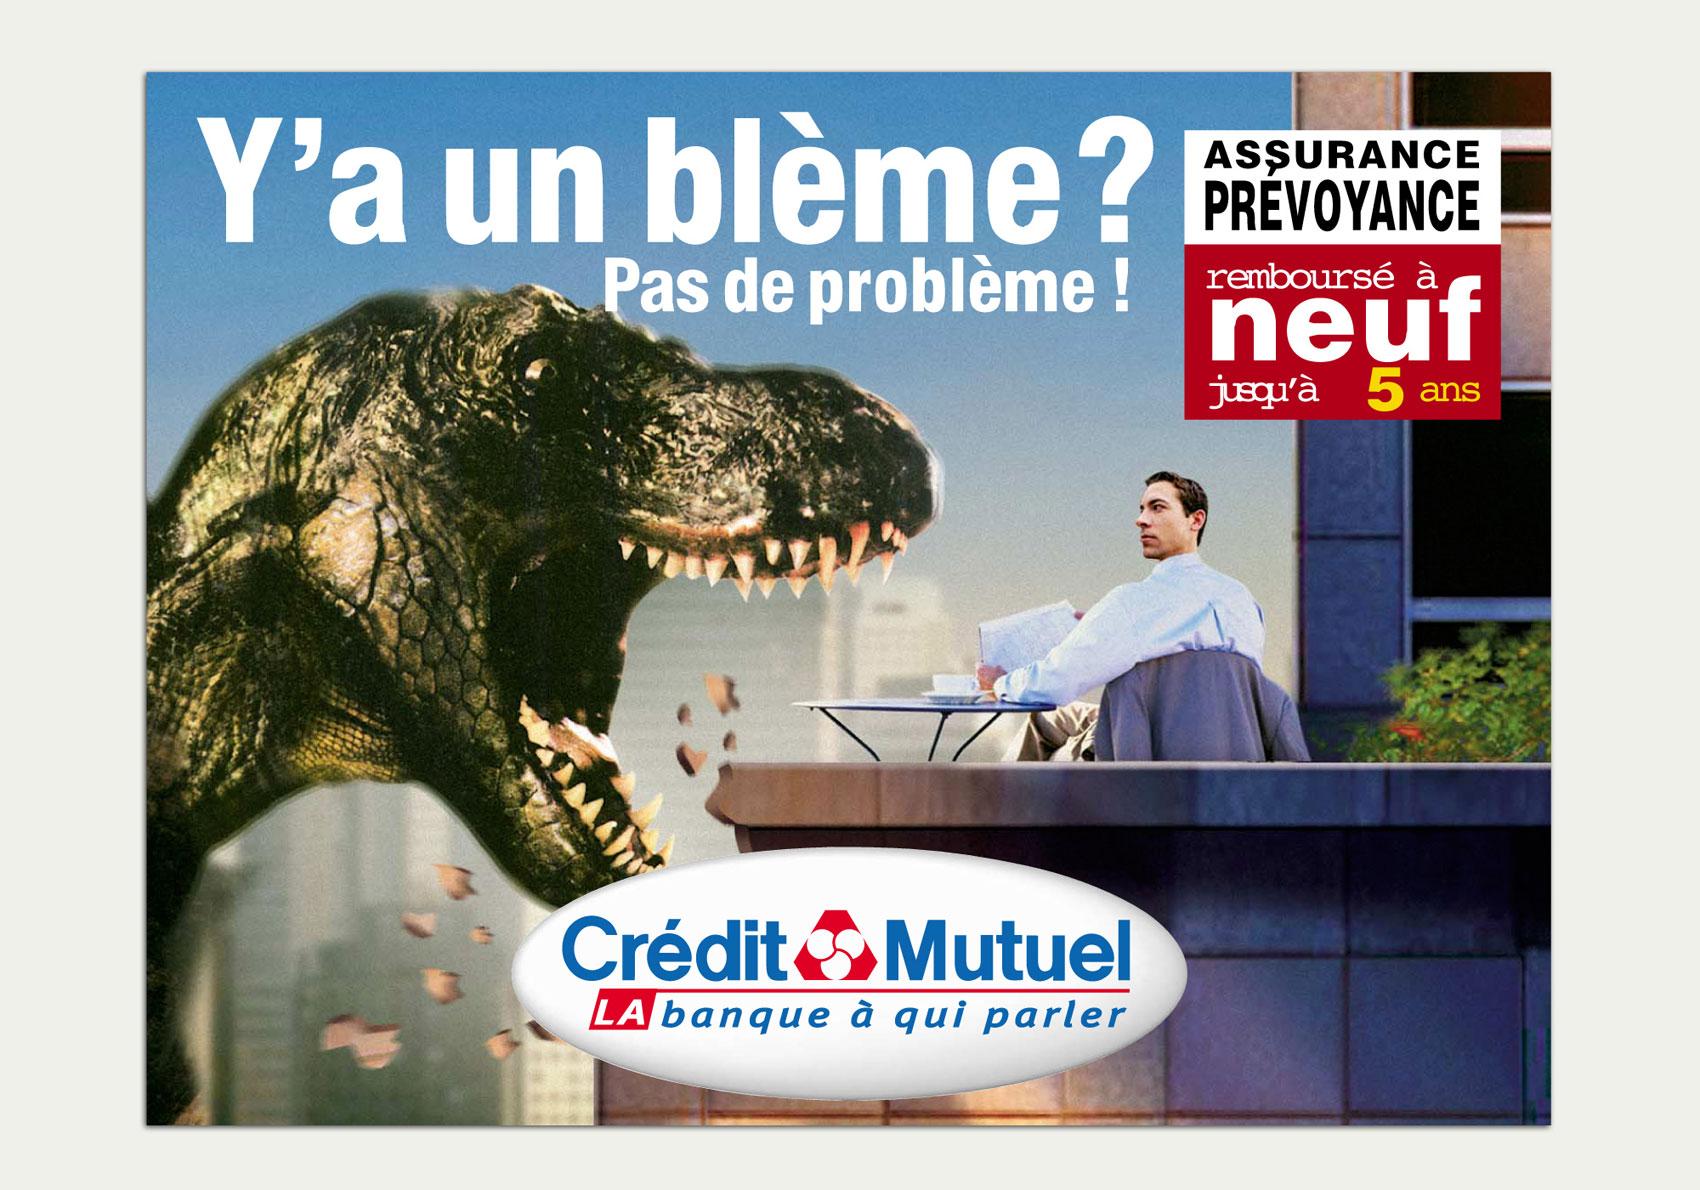 bancassurance-credit-mutuel-2002-1